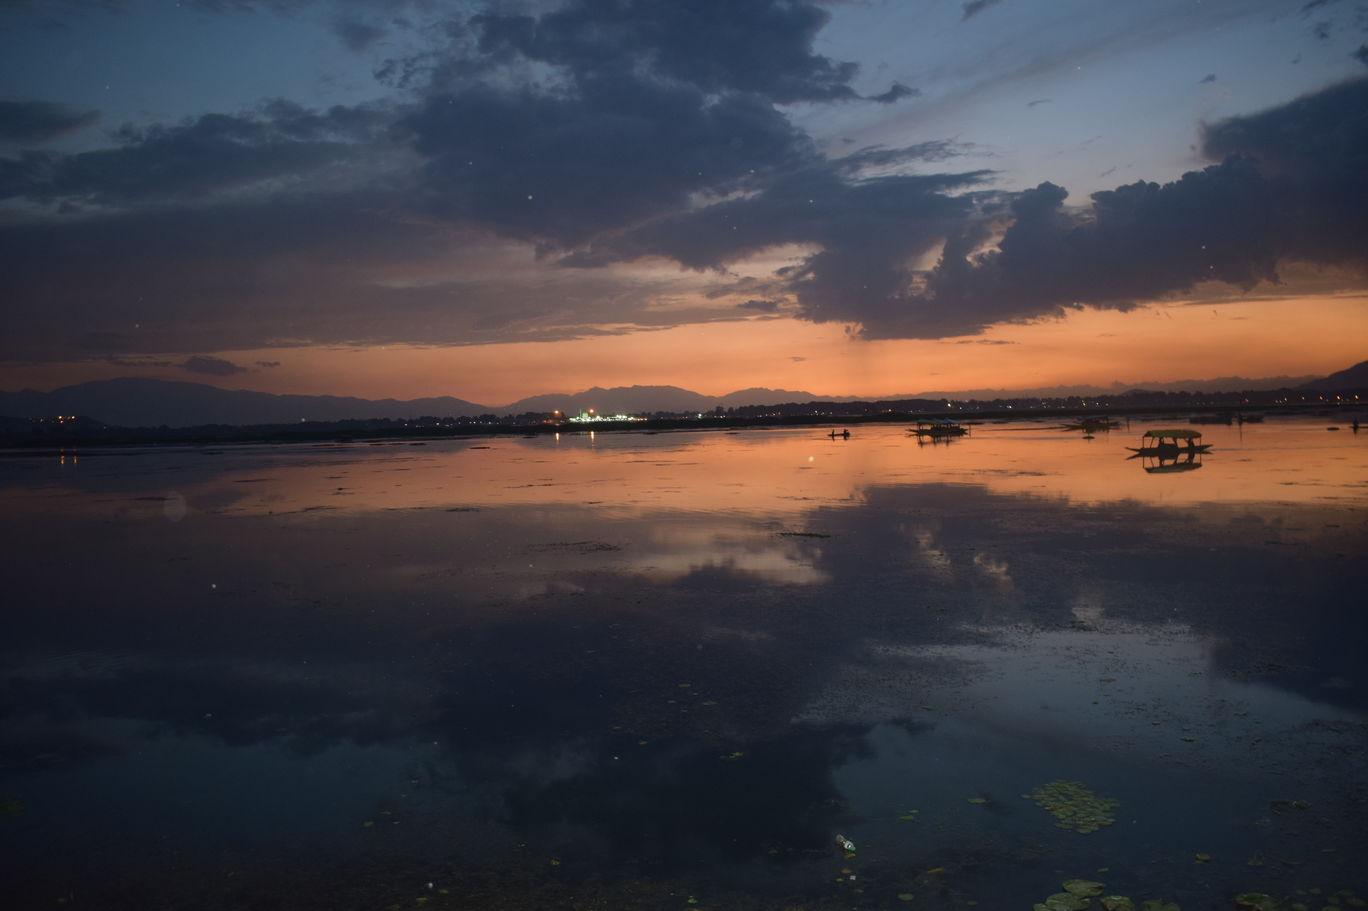 Photo of Dal Lake By Neda Hashmi